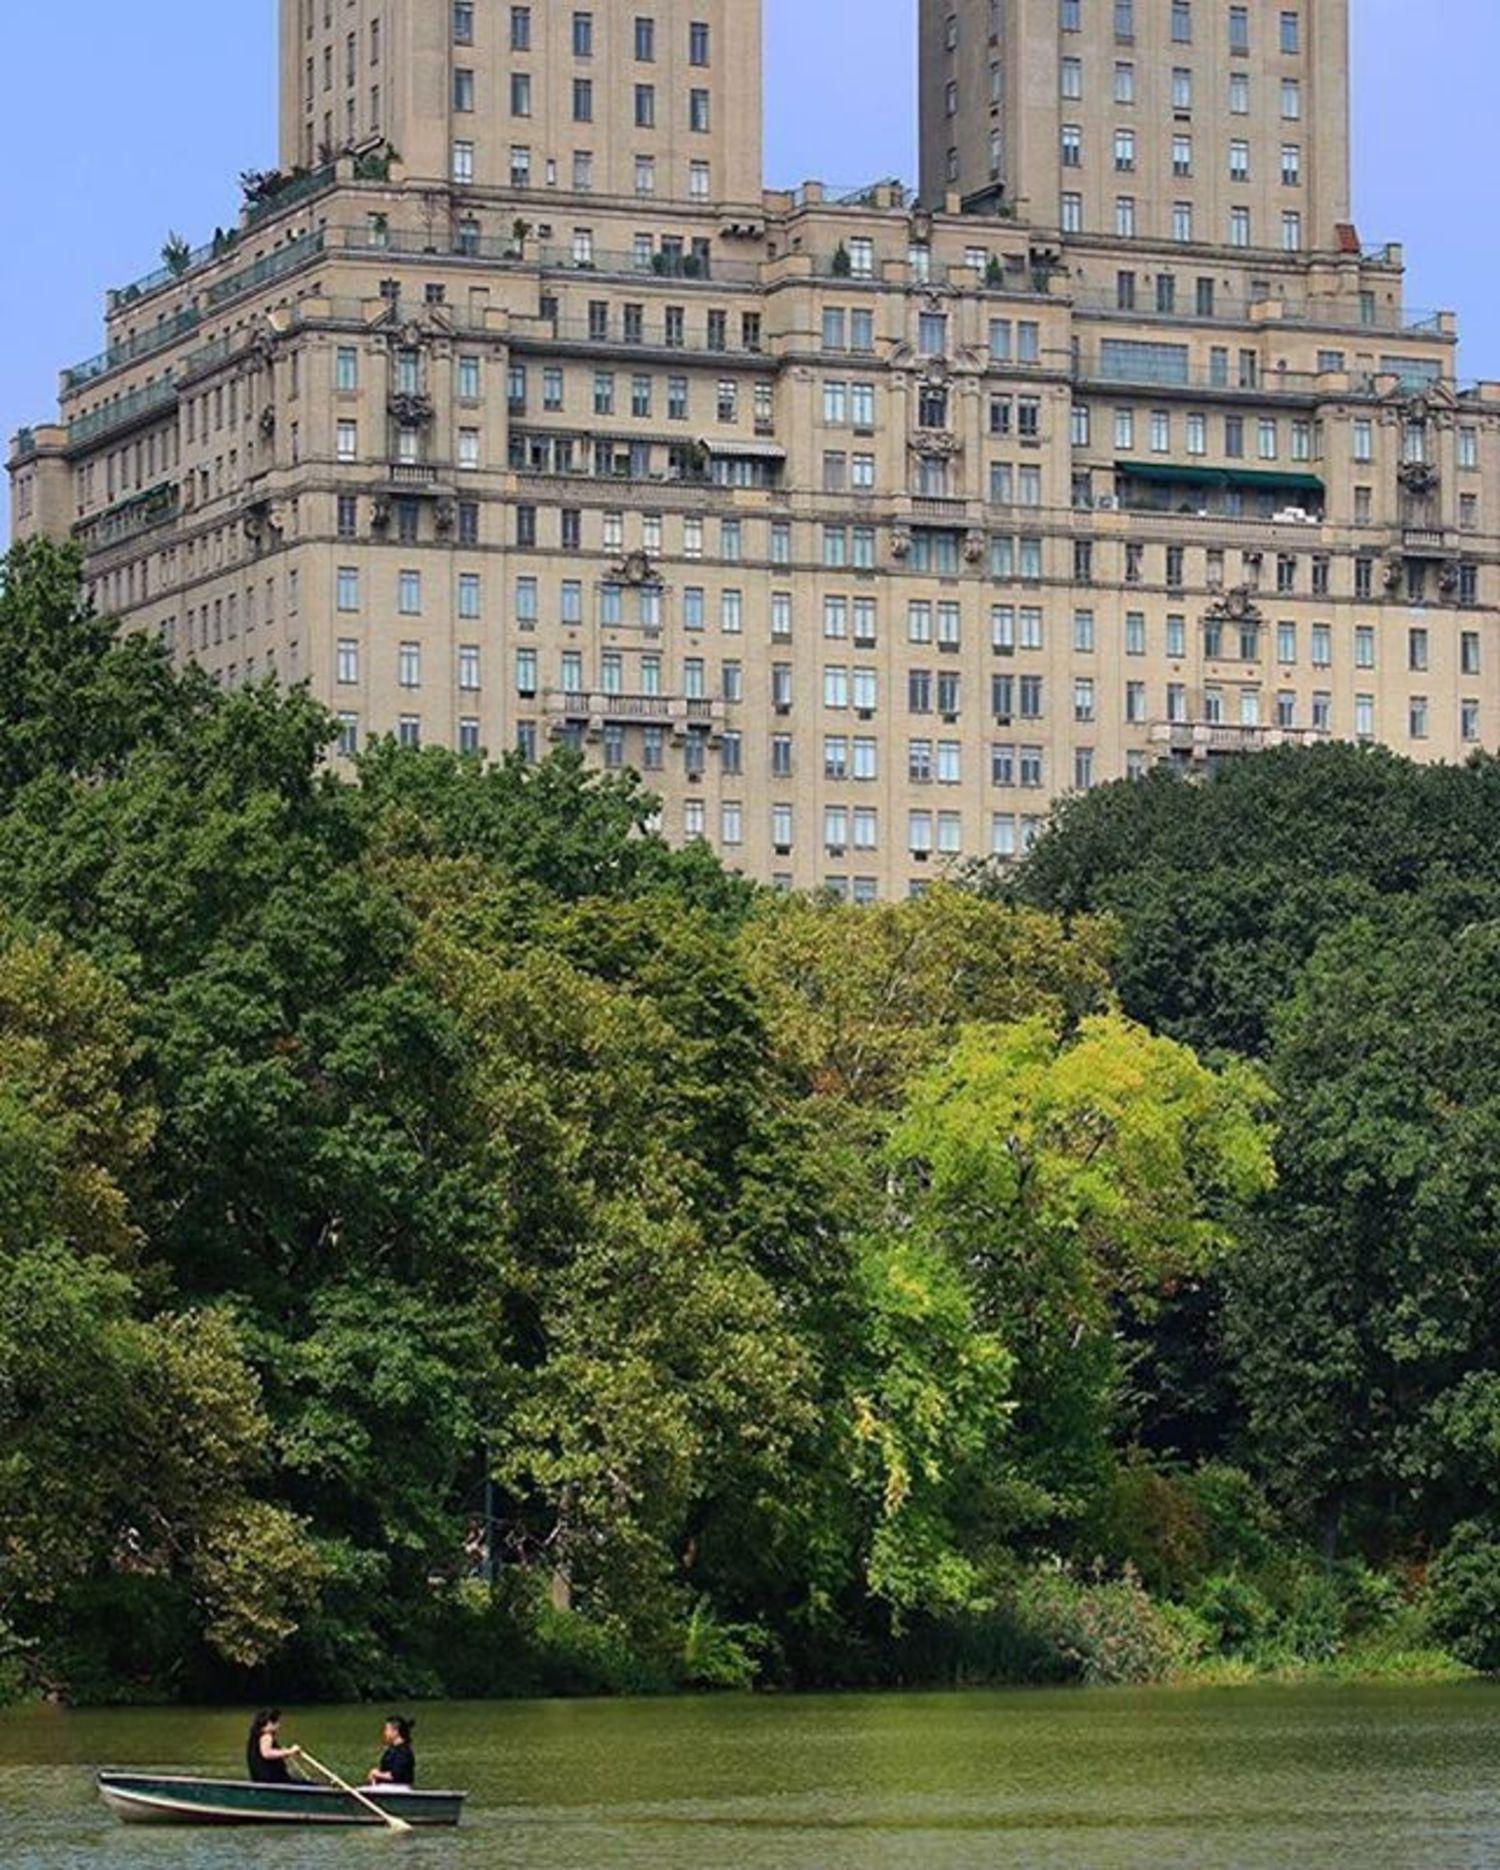 Central Park Lake, New York, New York. Photo via @ajax27 #viewingnyc #newyorkcity #newyork #nyc